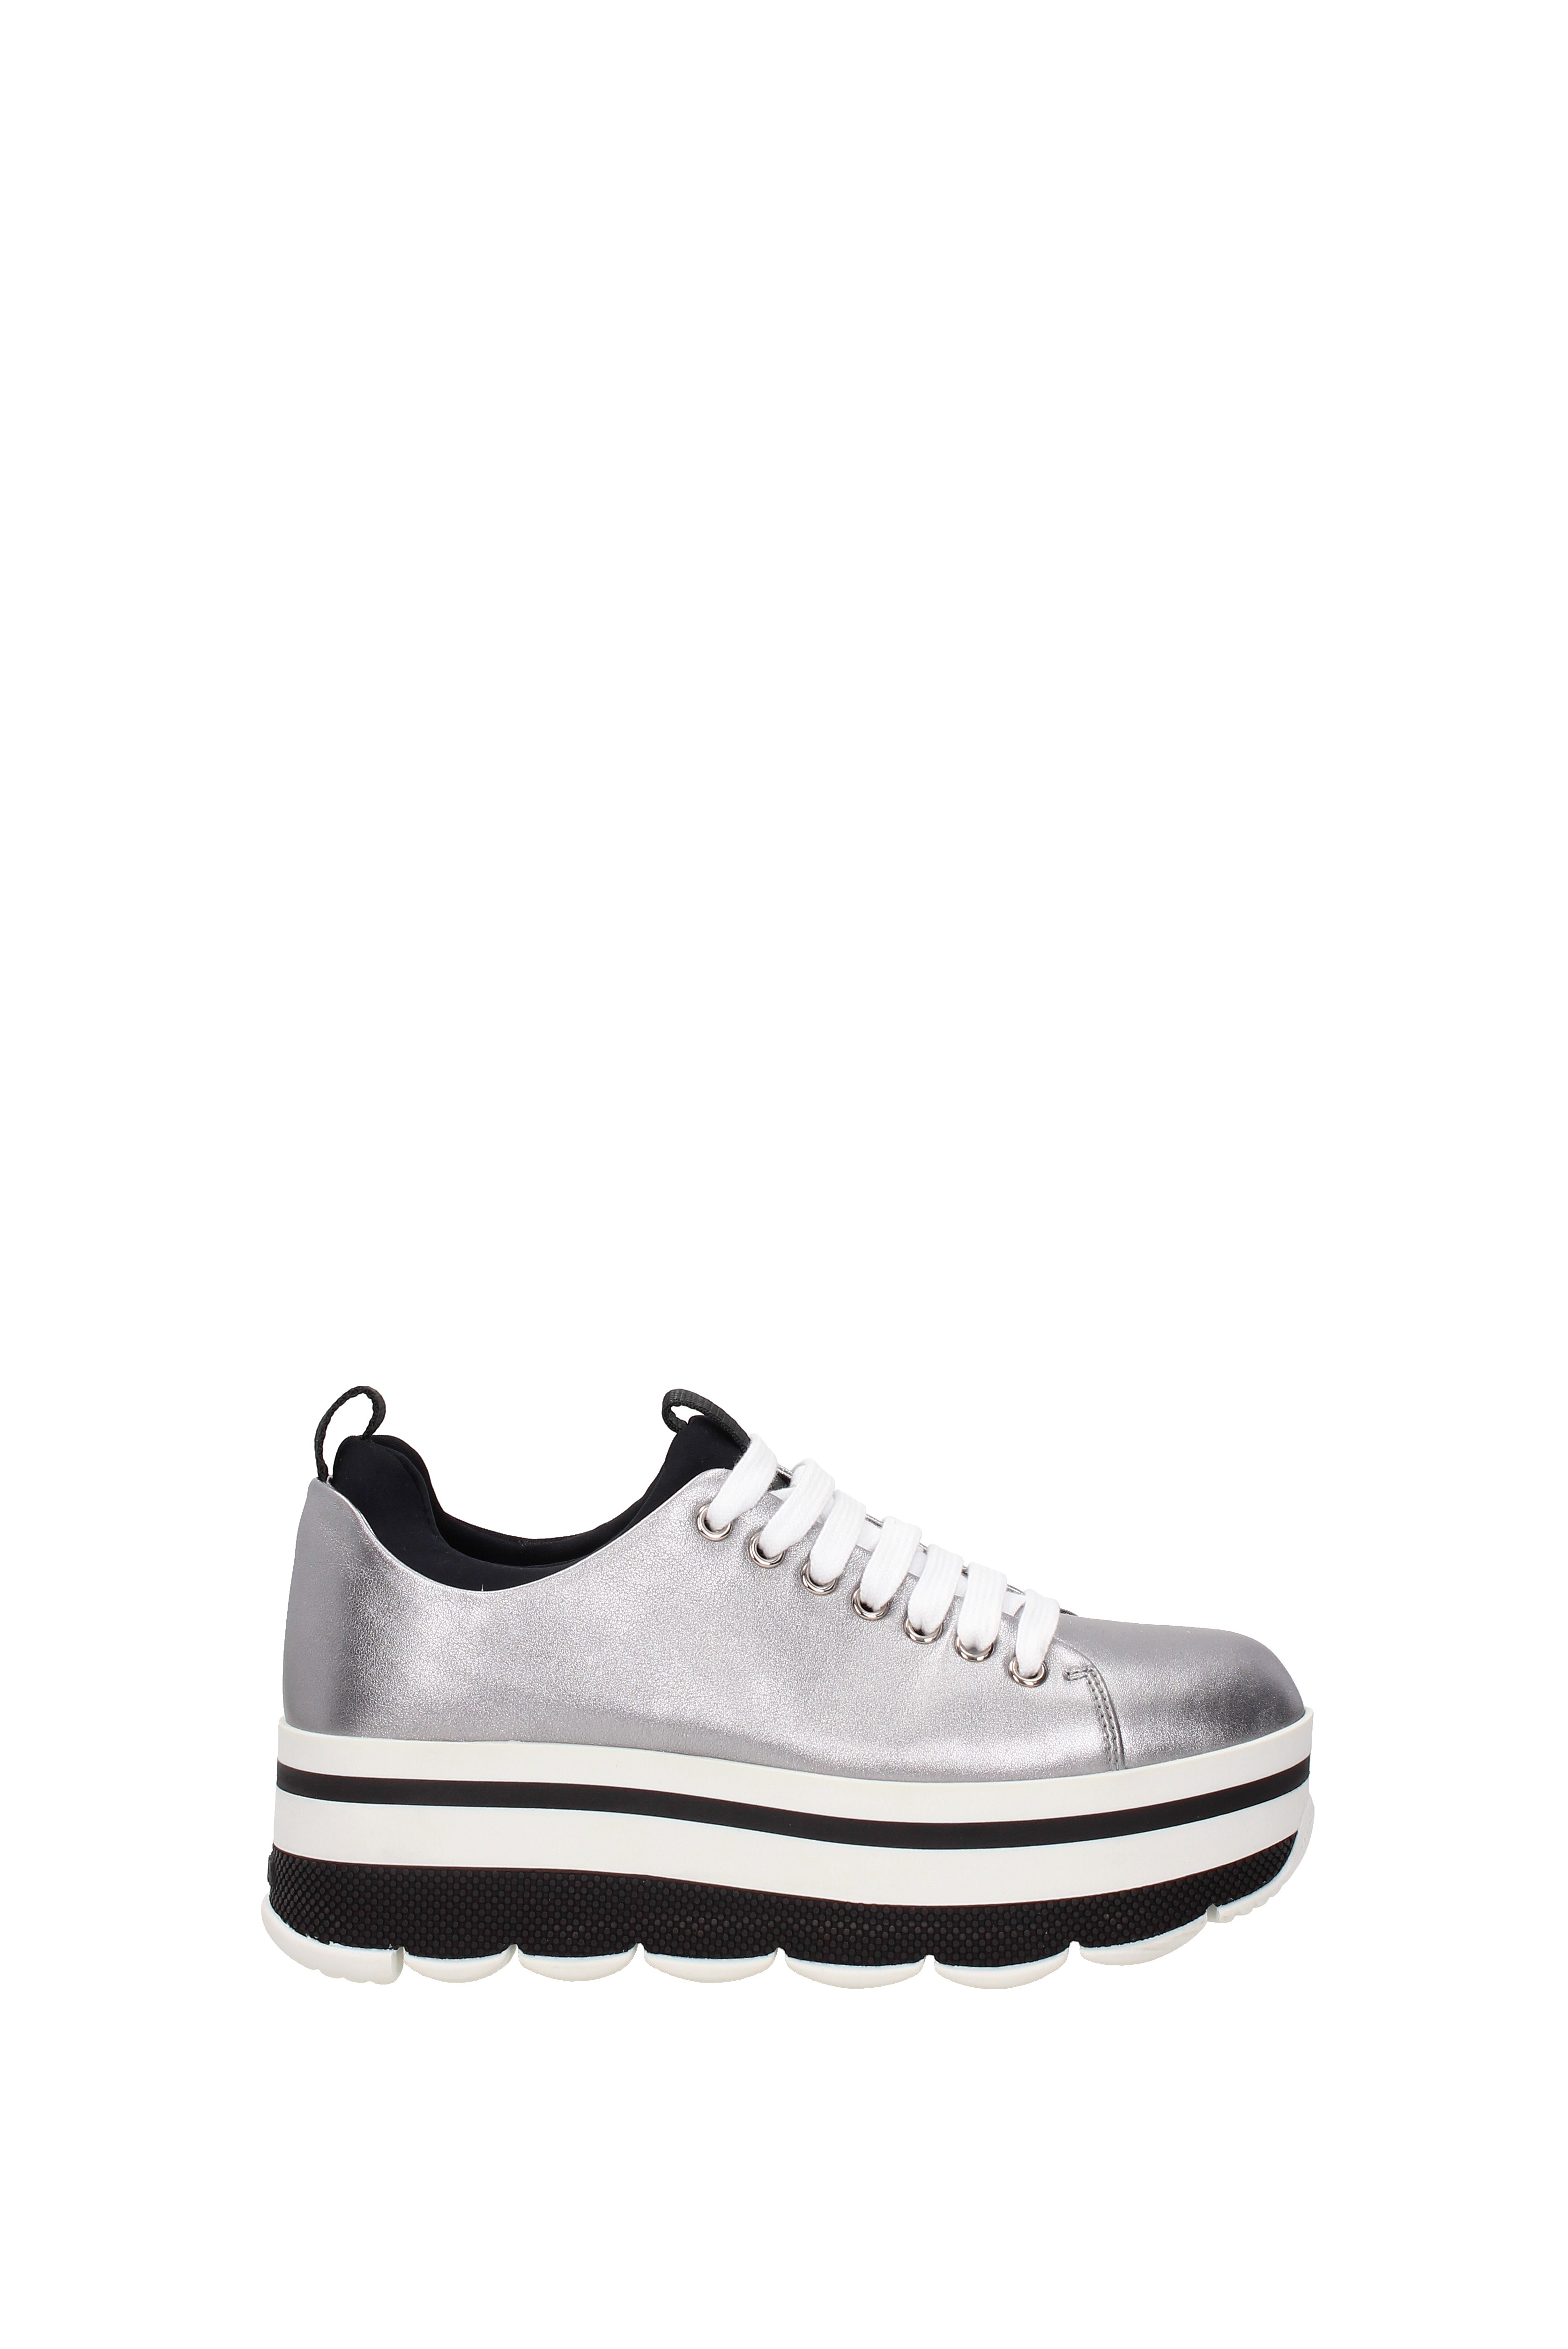 Sneakers-Prada-Donna-Pelle-3E6264VITSOFT